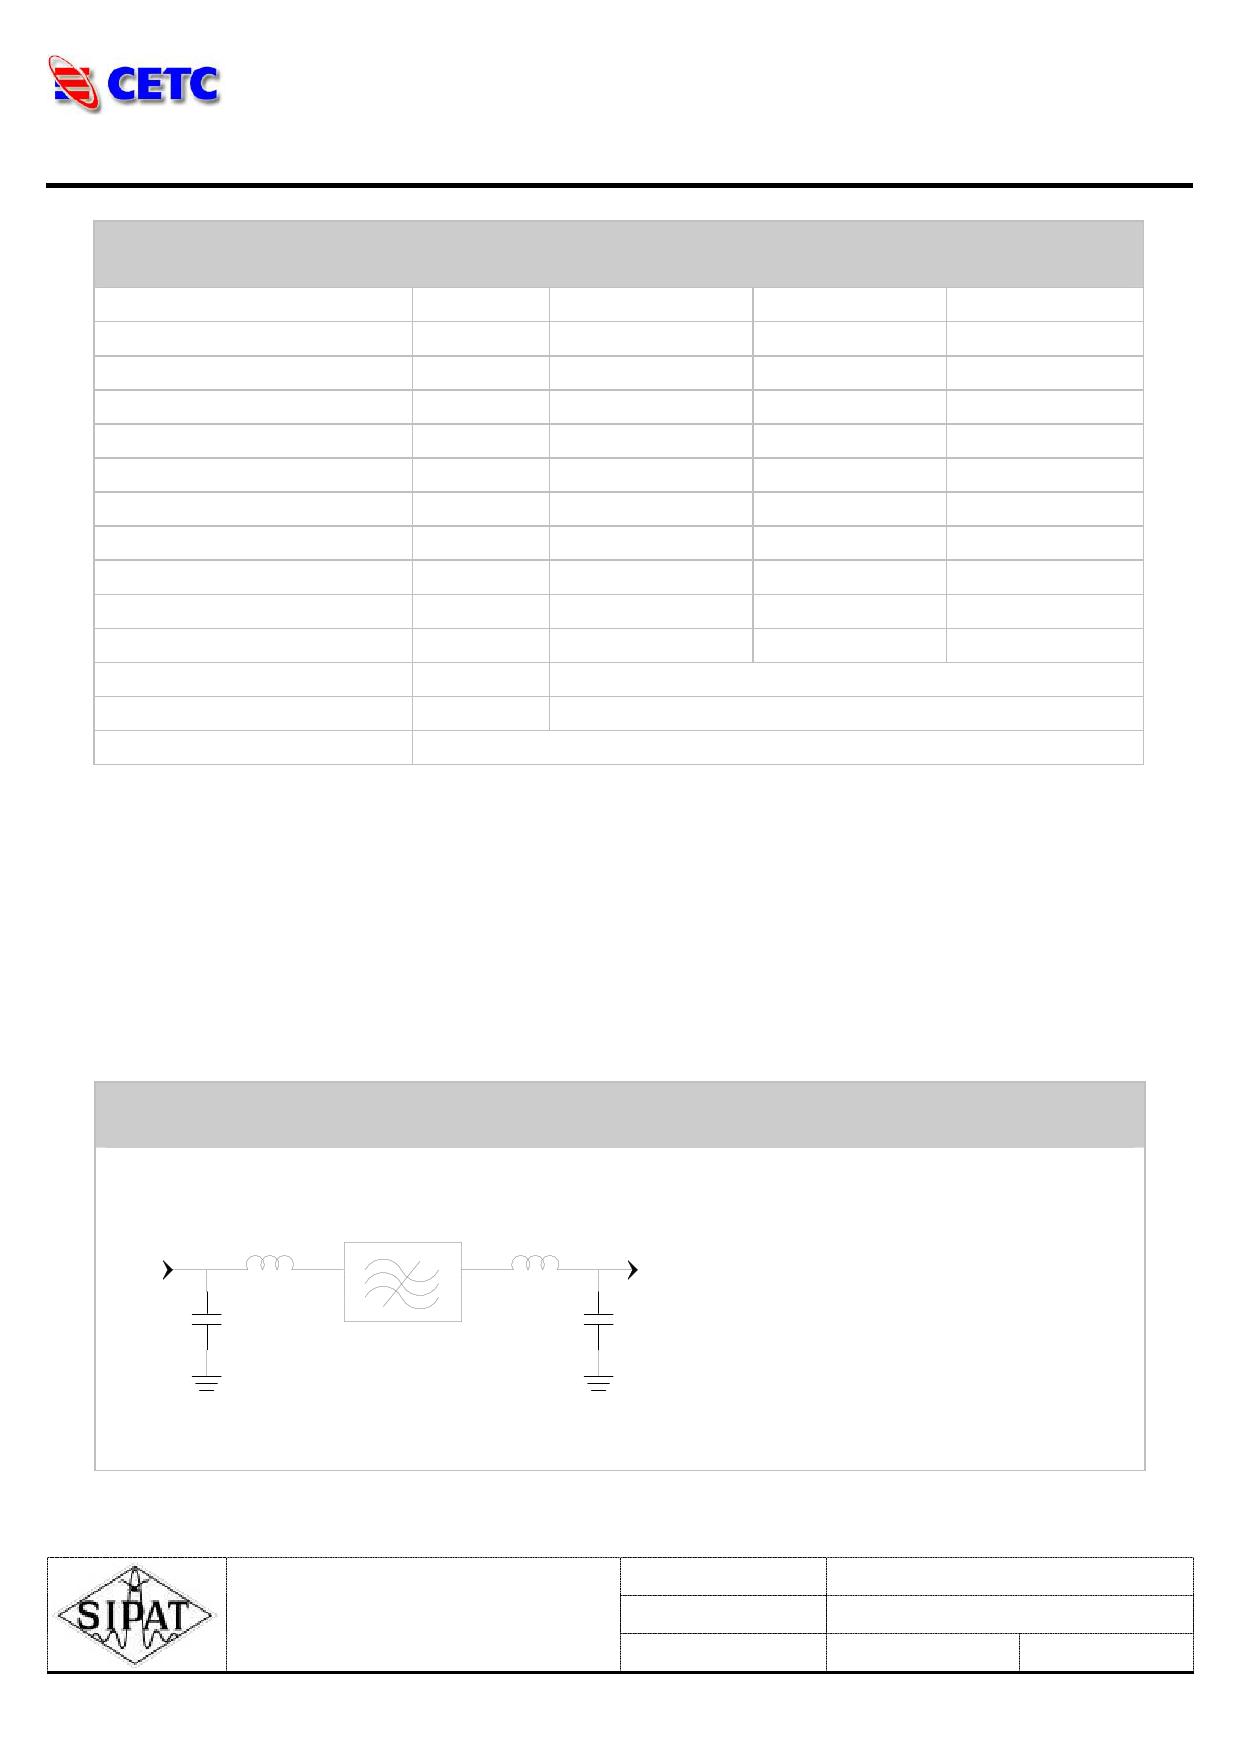 LBT14080 datasheet